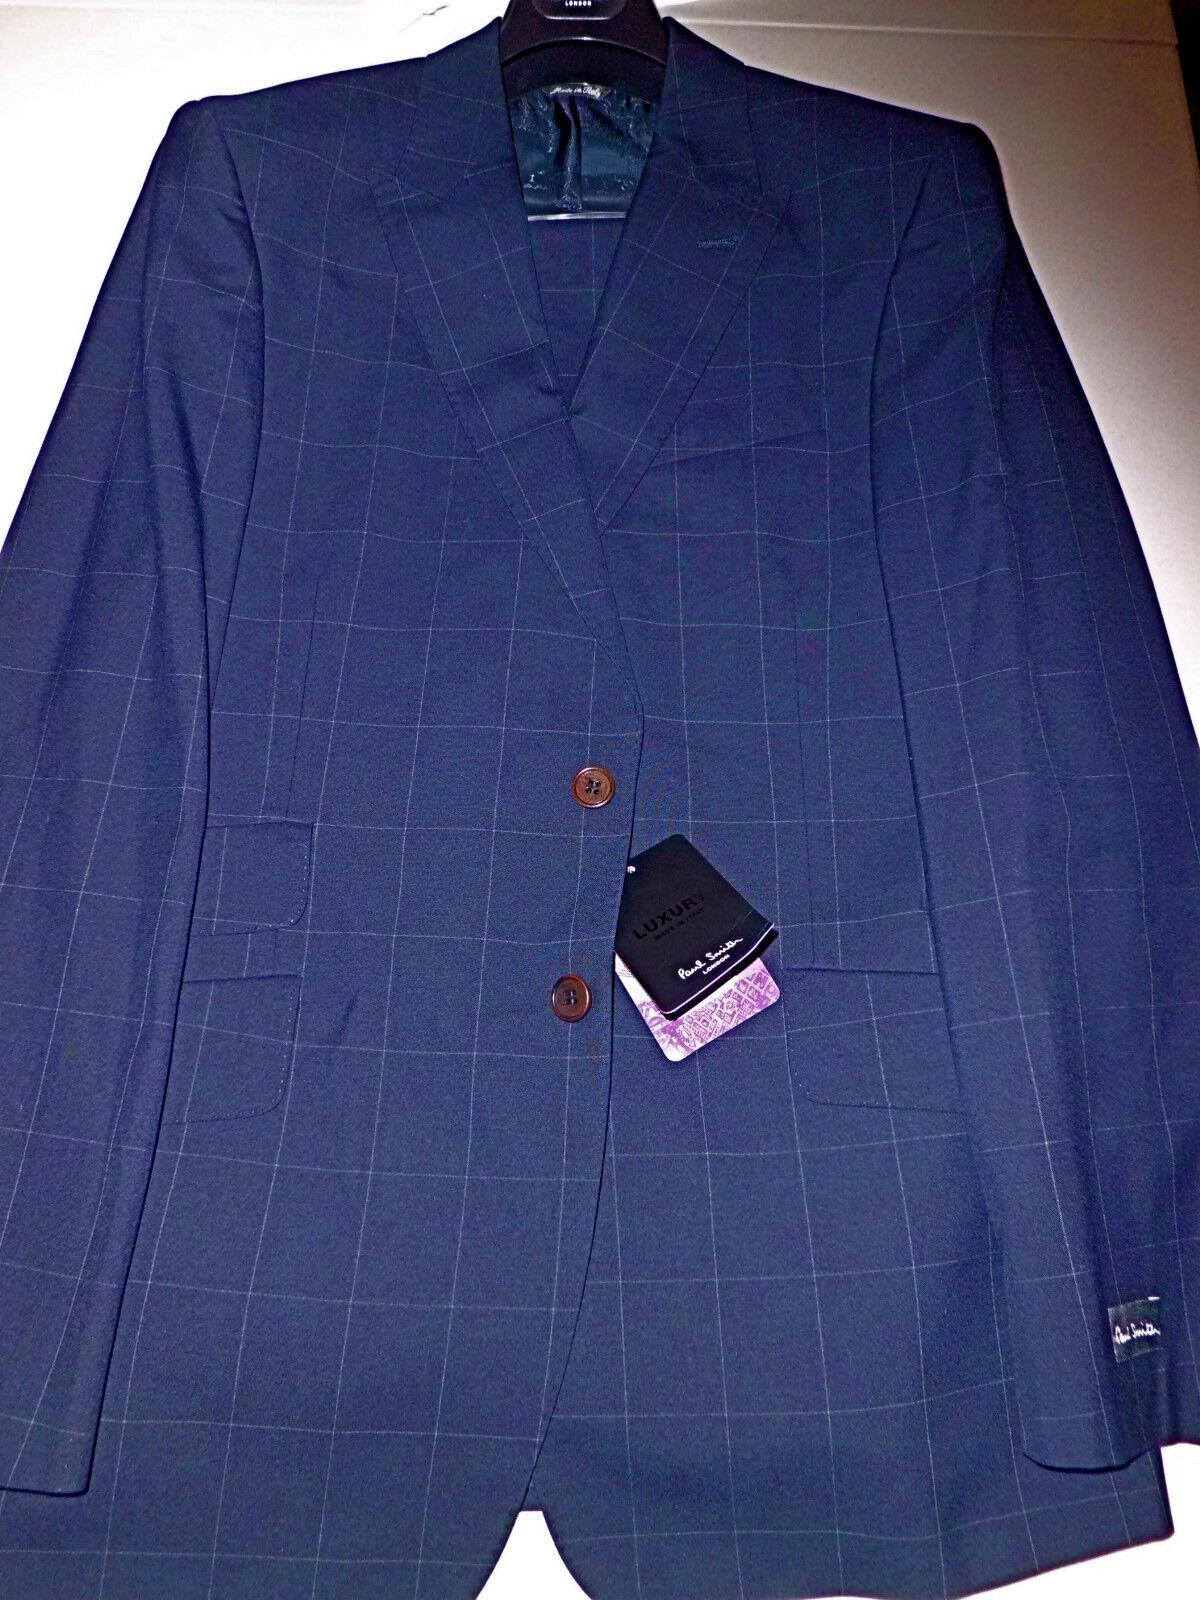 NWT PAUL SMITH navy windowpane 42 52 R peak lapel s120's wool Italian suit